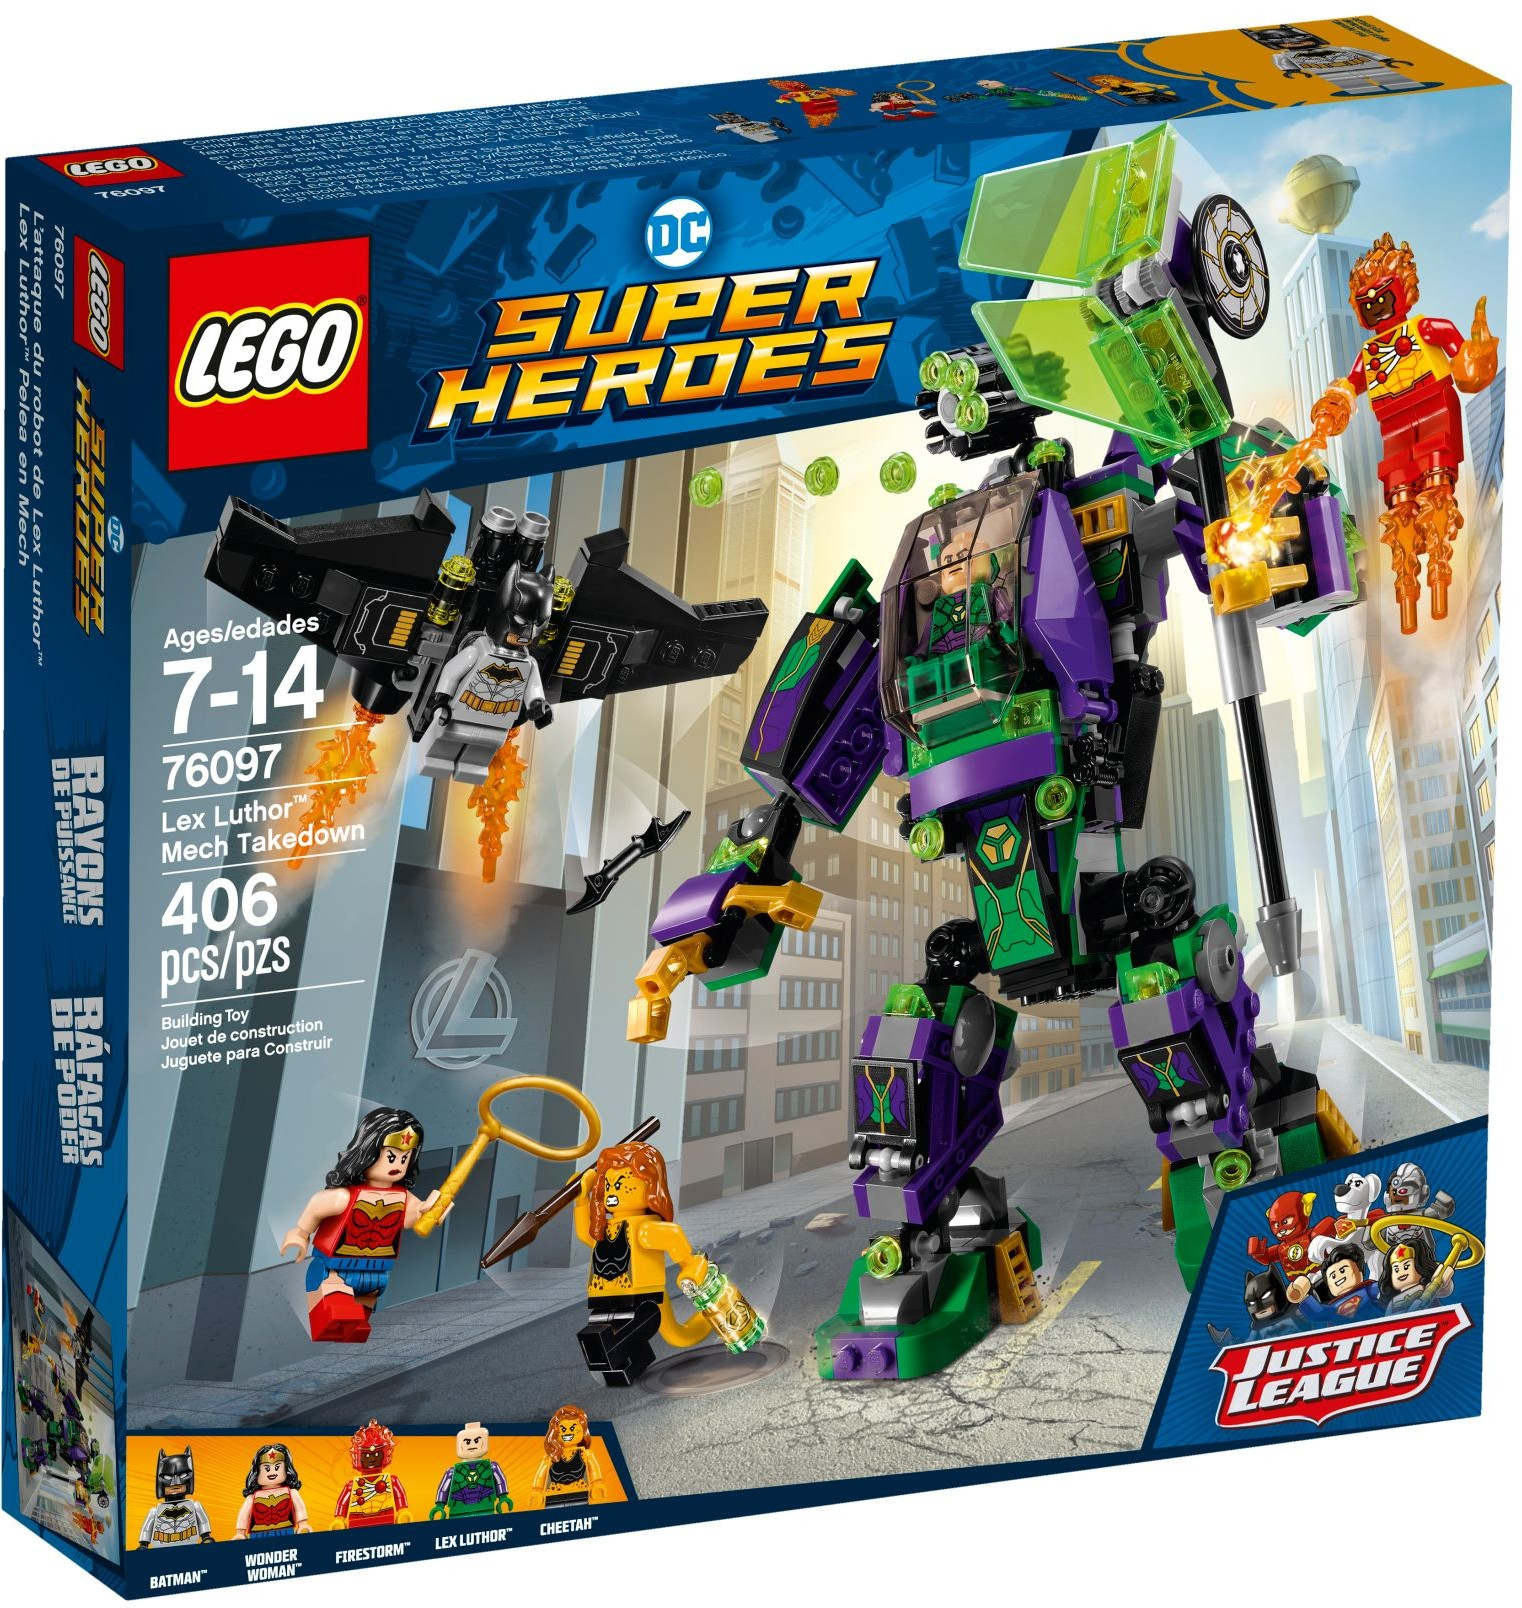 76097 Lex Luthor Mech Takedown